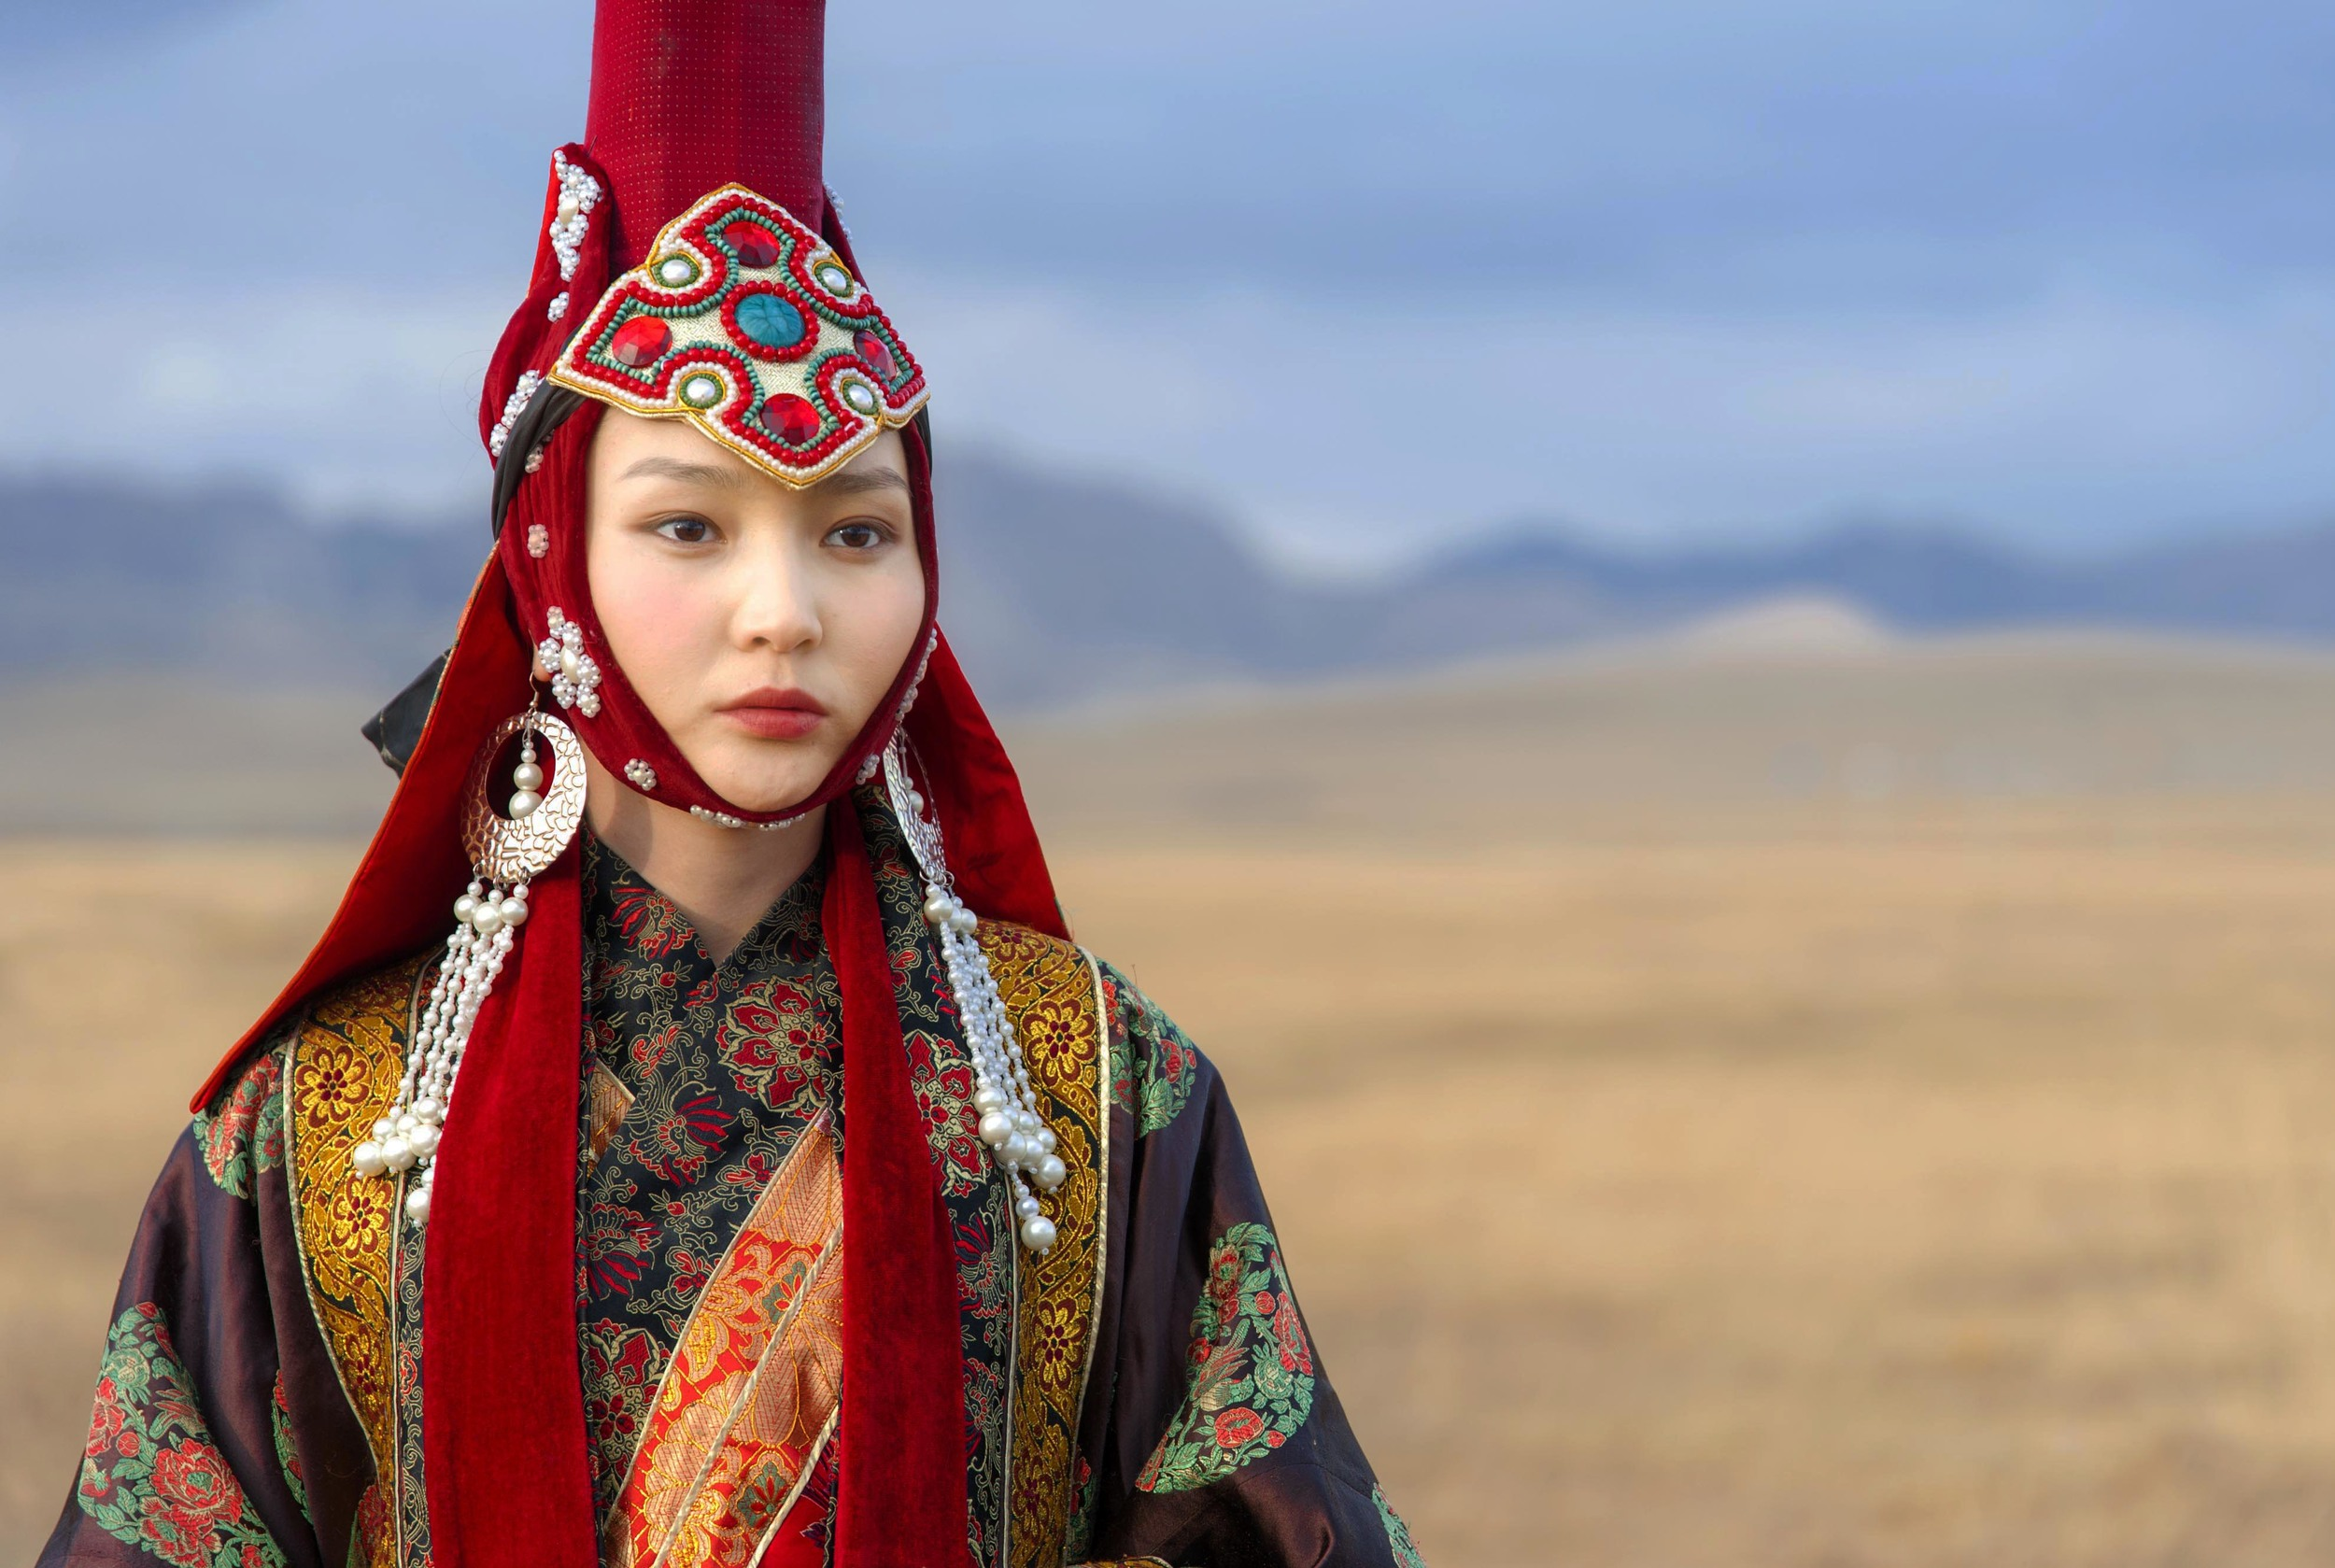 Mongolia 13th century queen.jpg